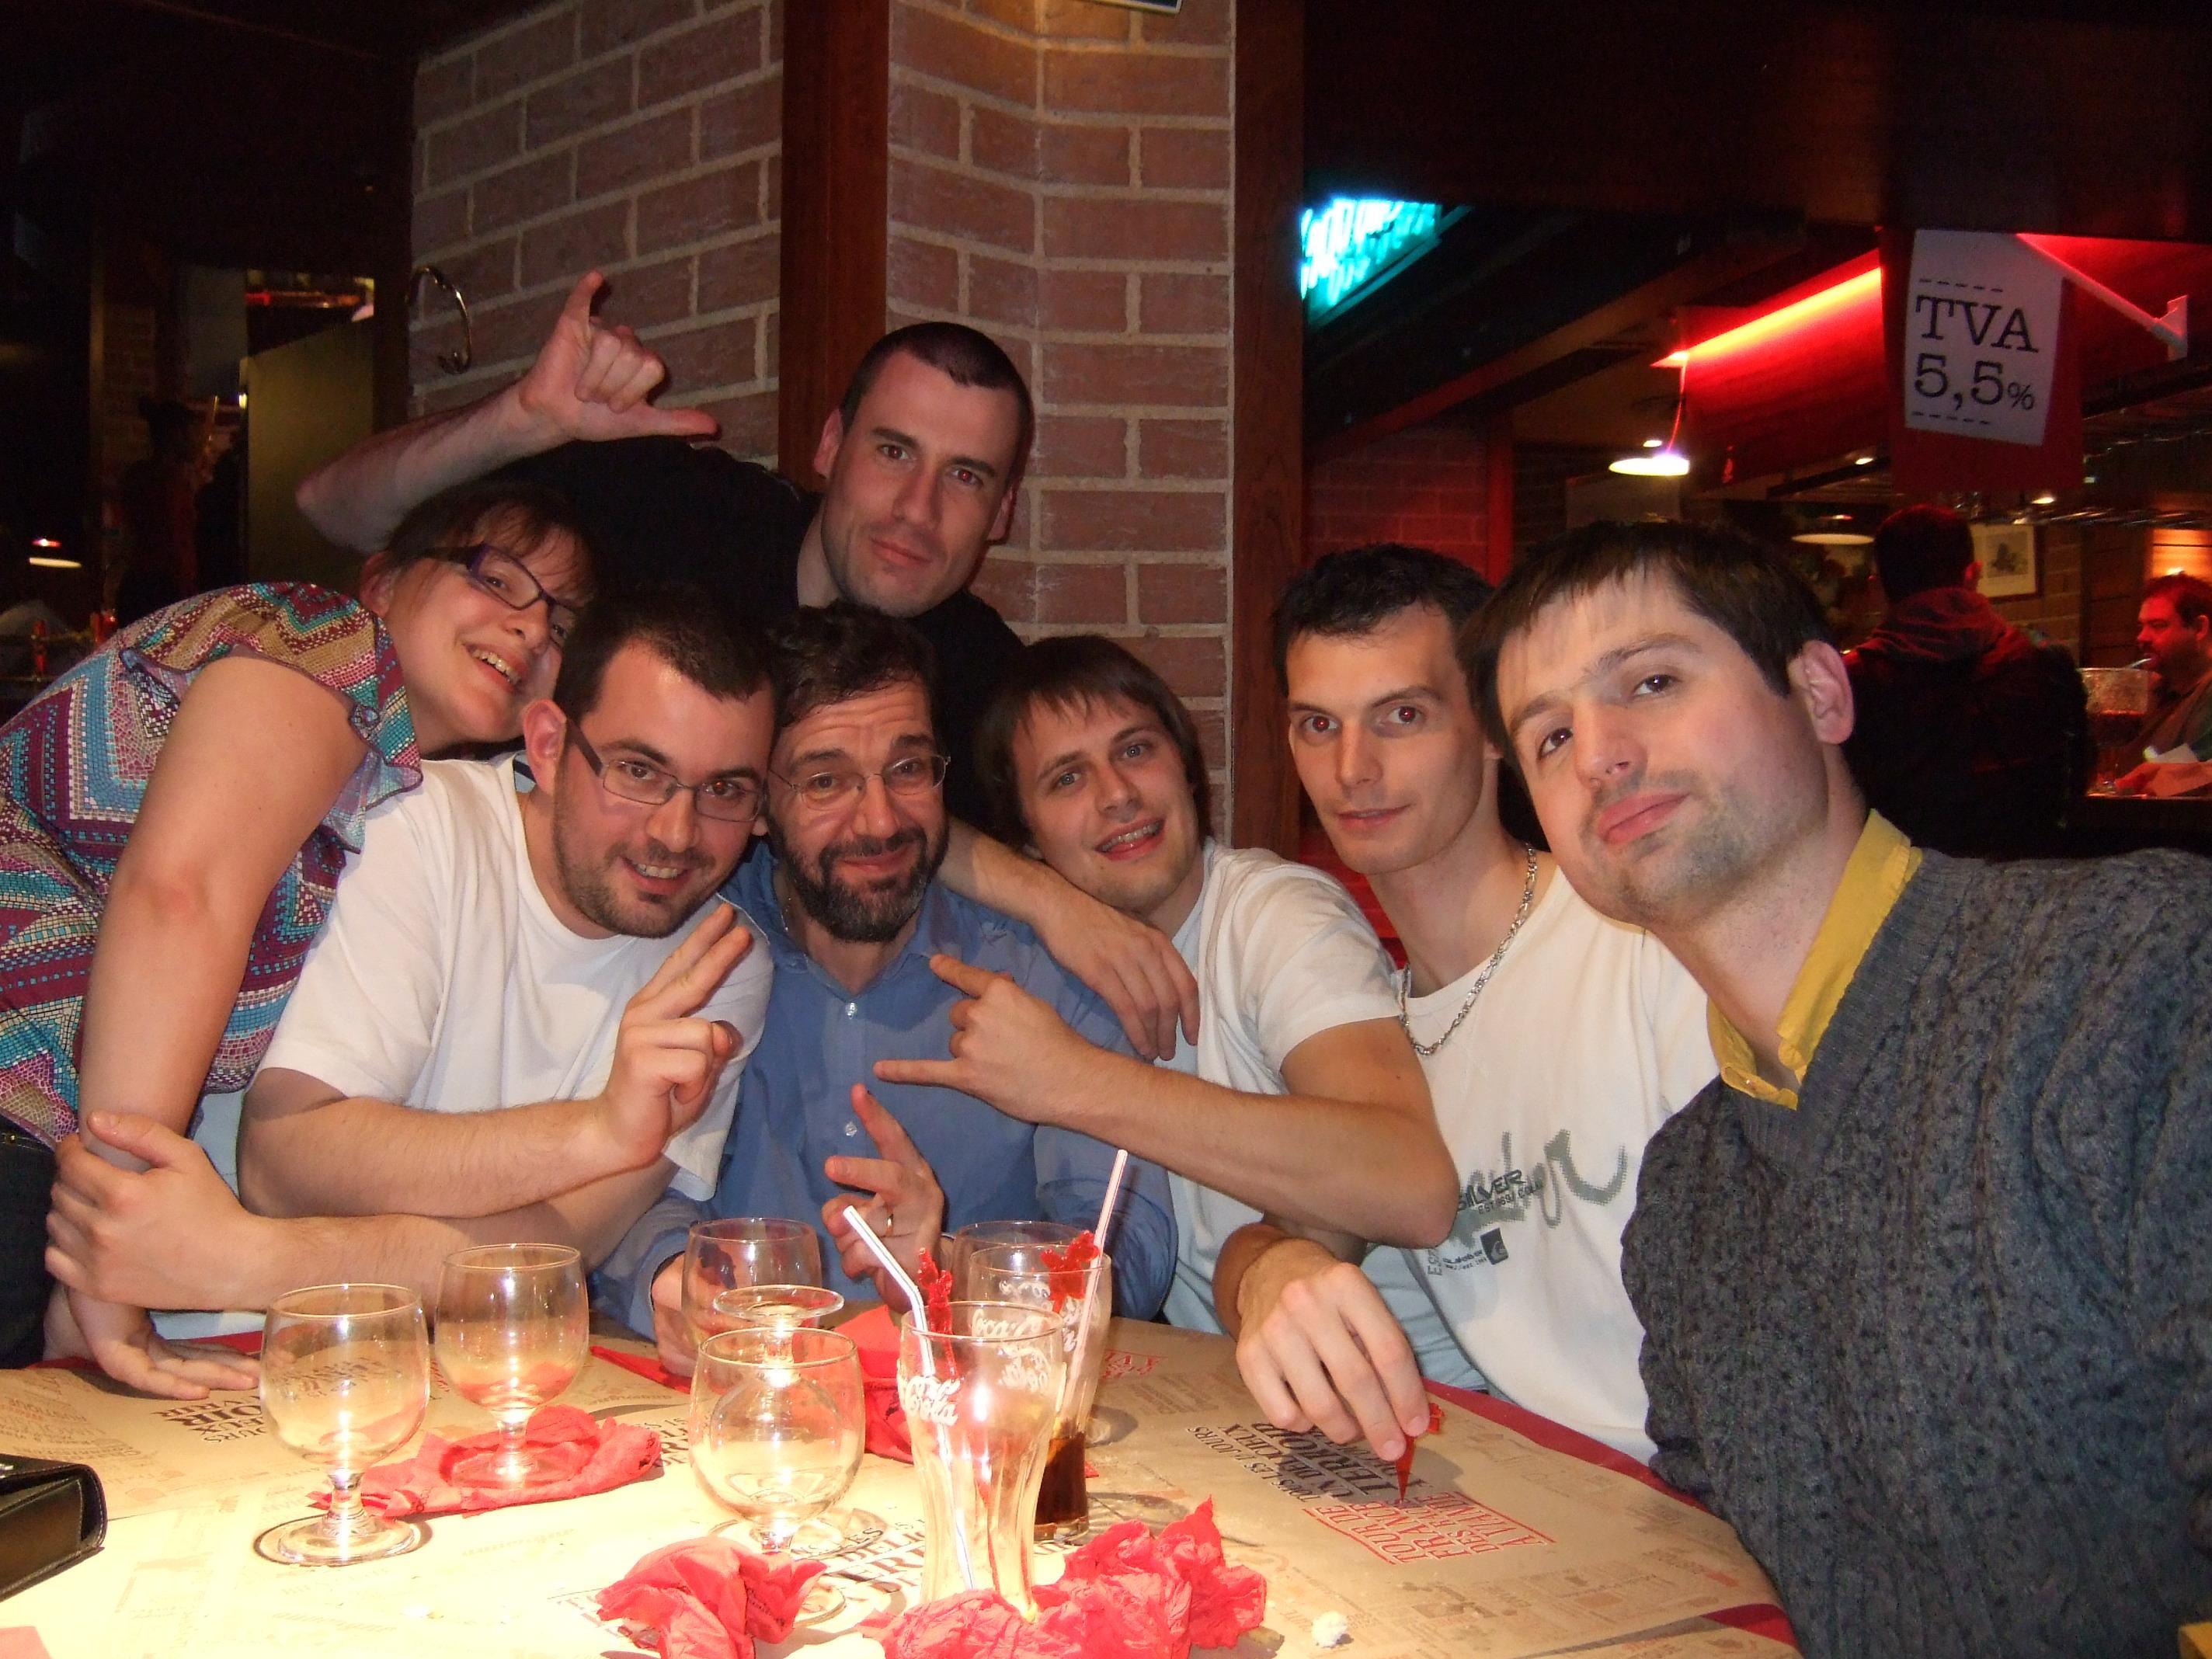 Photo 4 - Padmeia, boba.fett7, Joruus29, c3po75, Anakin07, Alpha8, Kardass